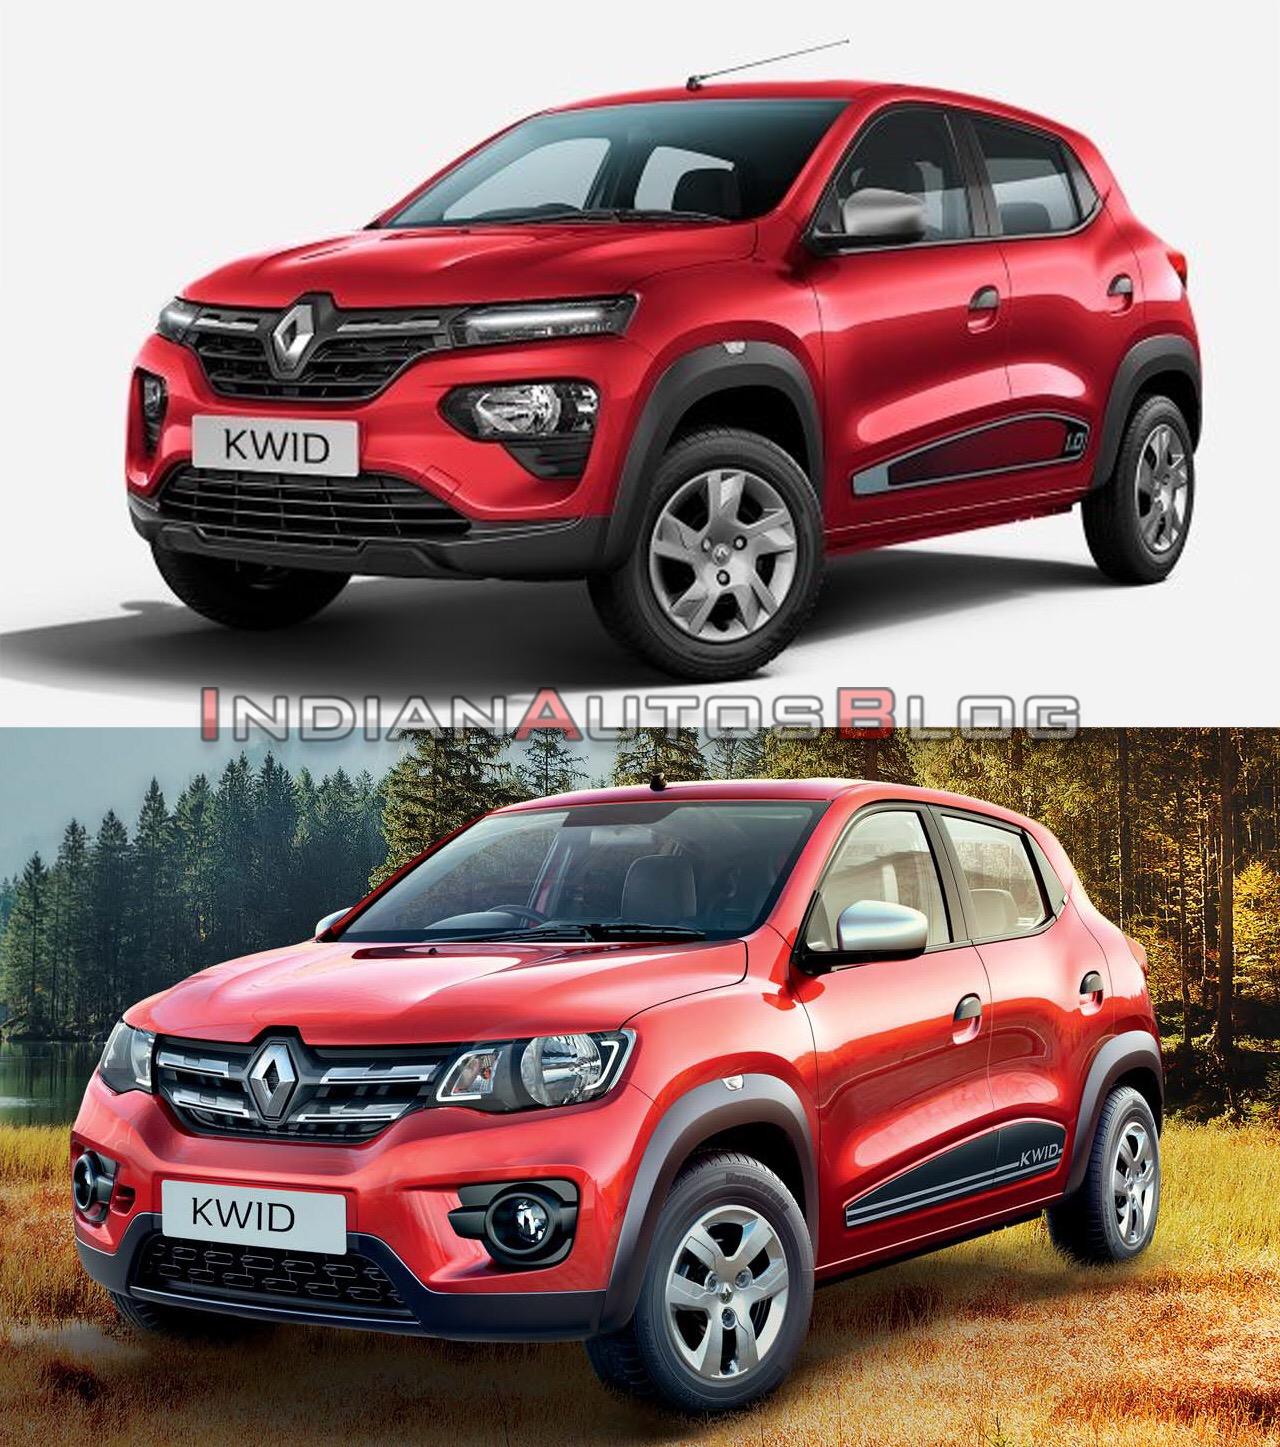 New Renault: 2020 Renault Kwid (facelift) Vs. 2016 Renault Kwid